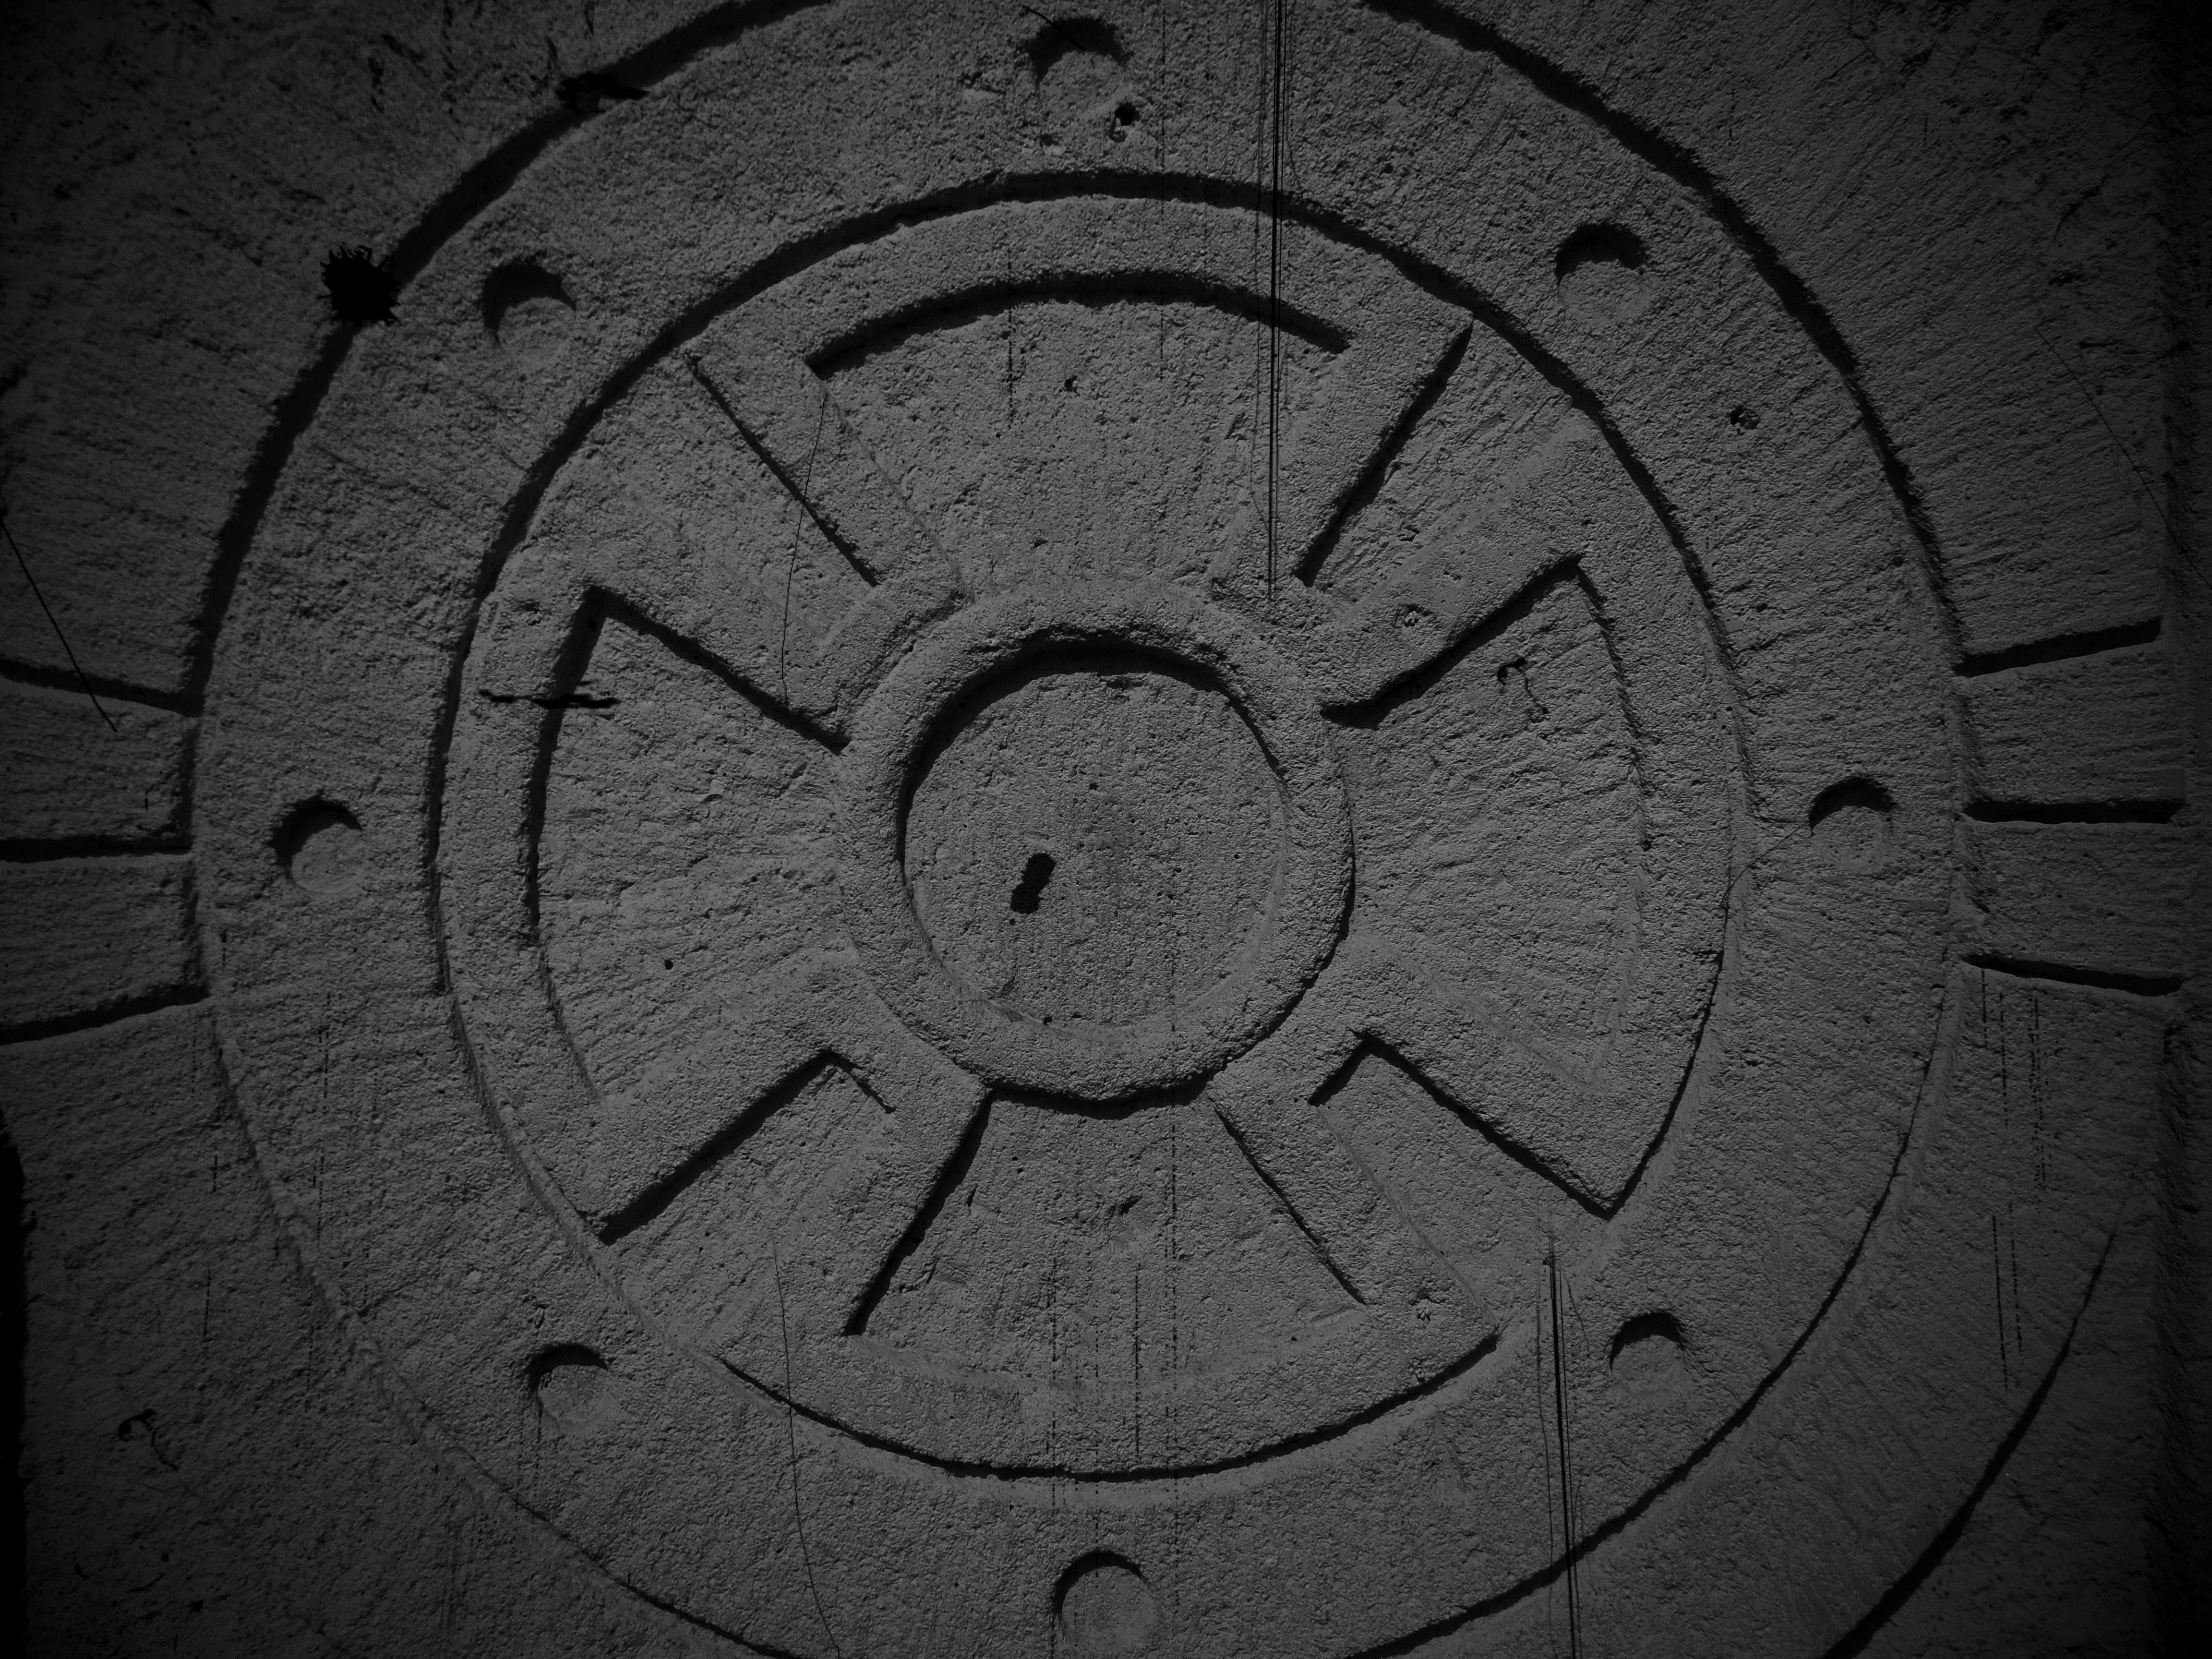 Calendario Free.Free Stock Photo Of Calendario Maya